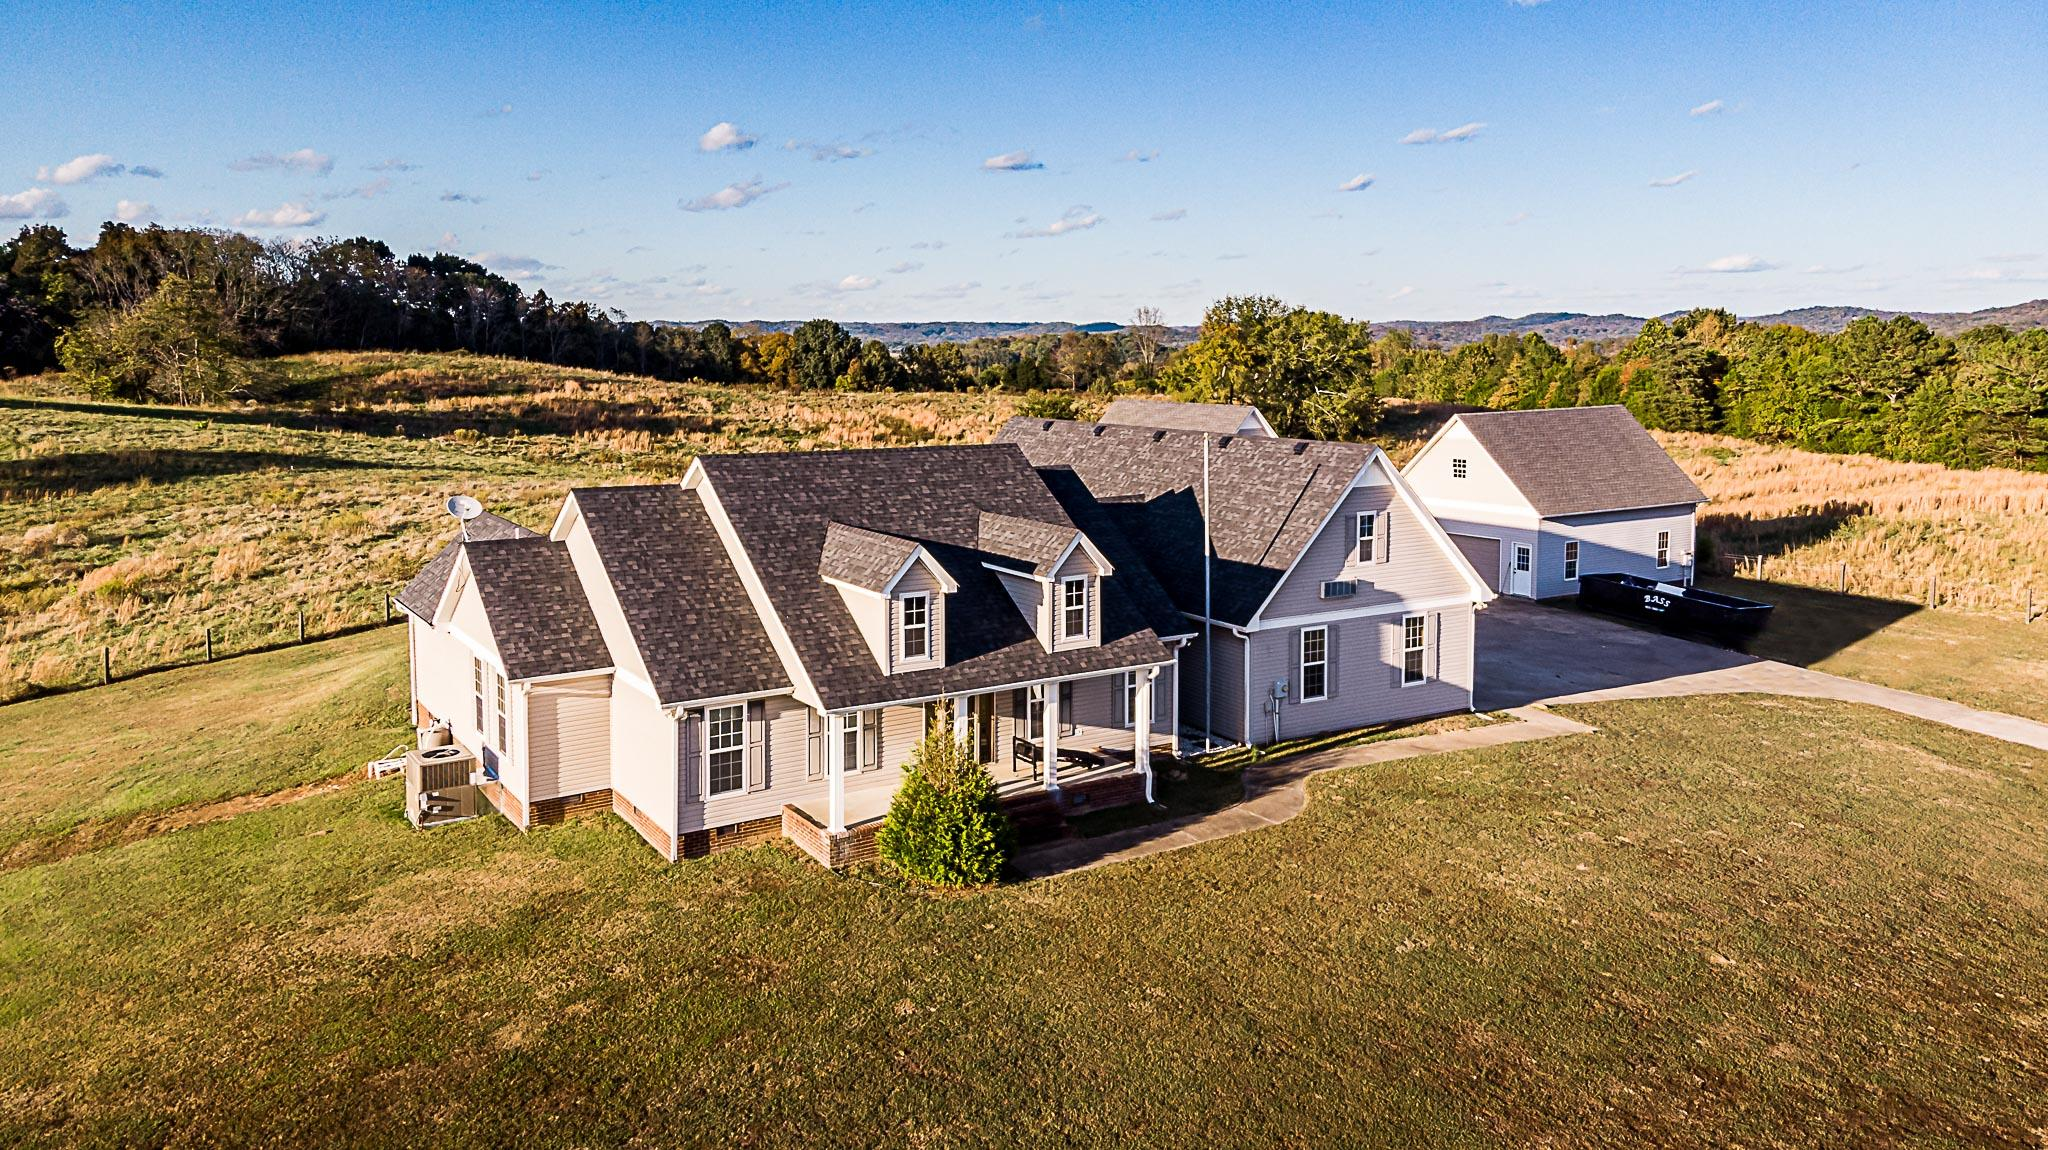 1555 Poplar Hill Rd, Prospect, TN 38477 - Prospect, TN real estate listing